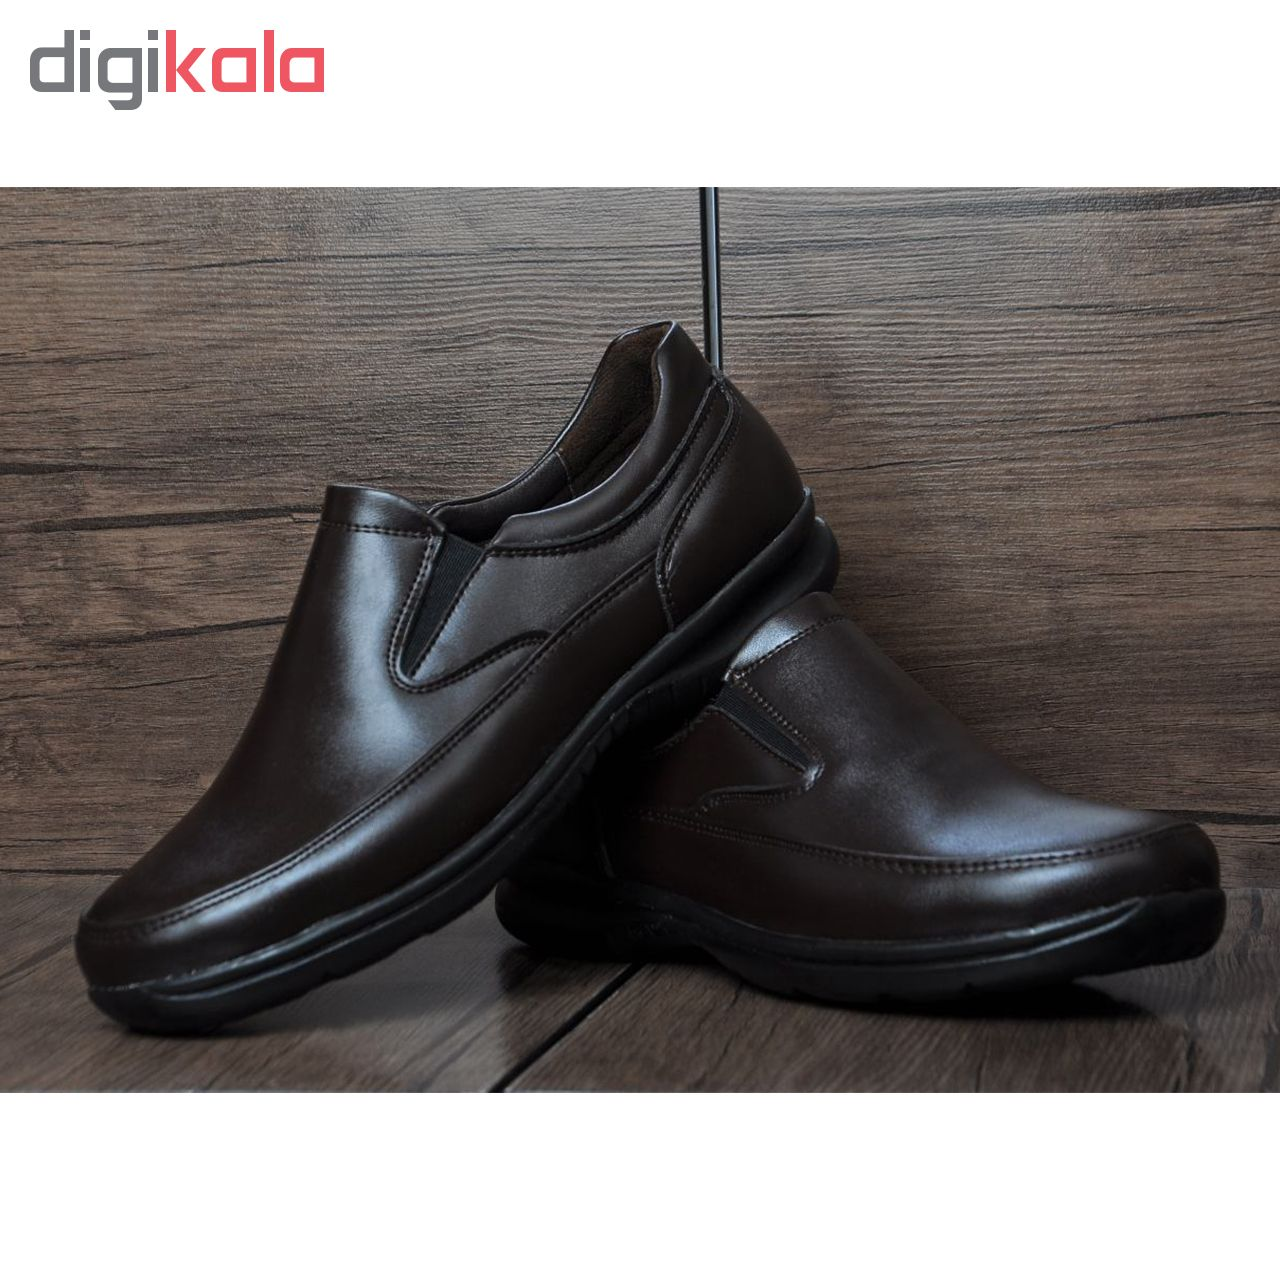 قیمت خرید کفش روزمره مردانه مدل NGM greder GH اورجینال